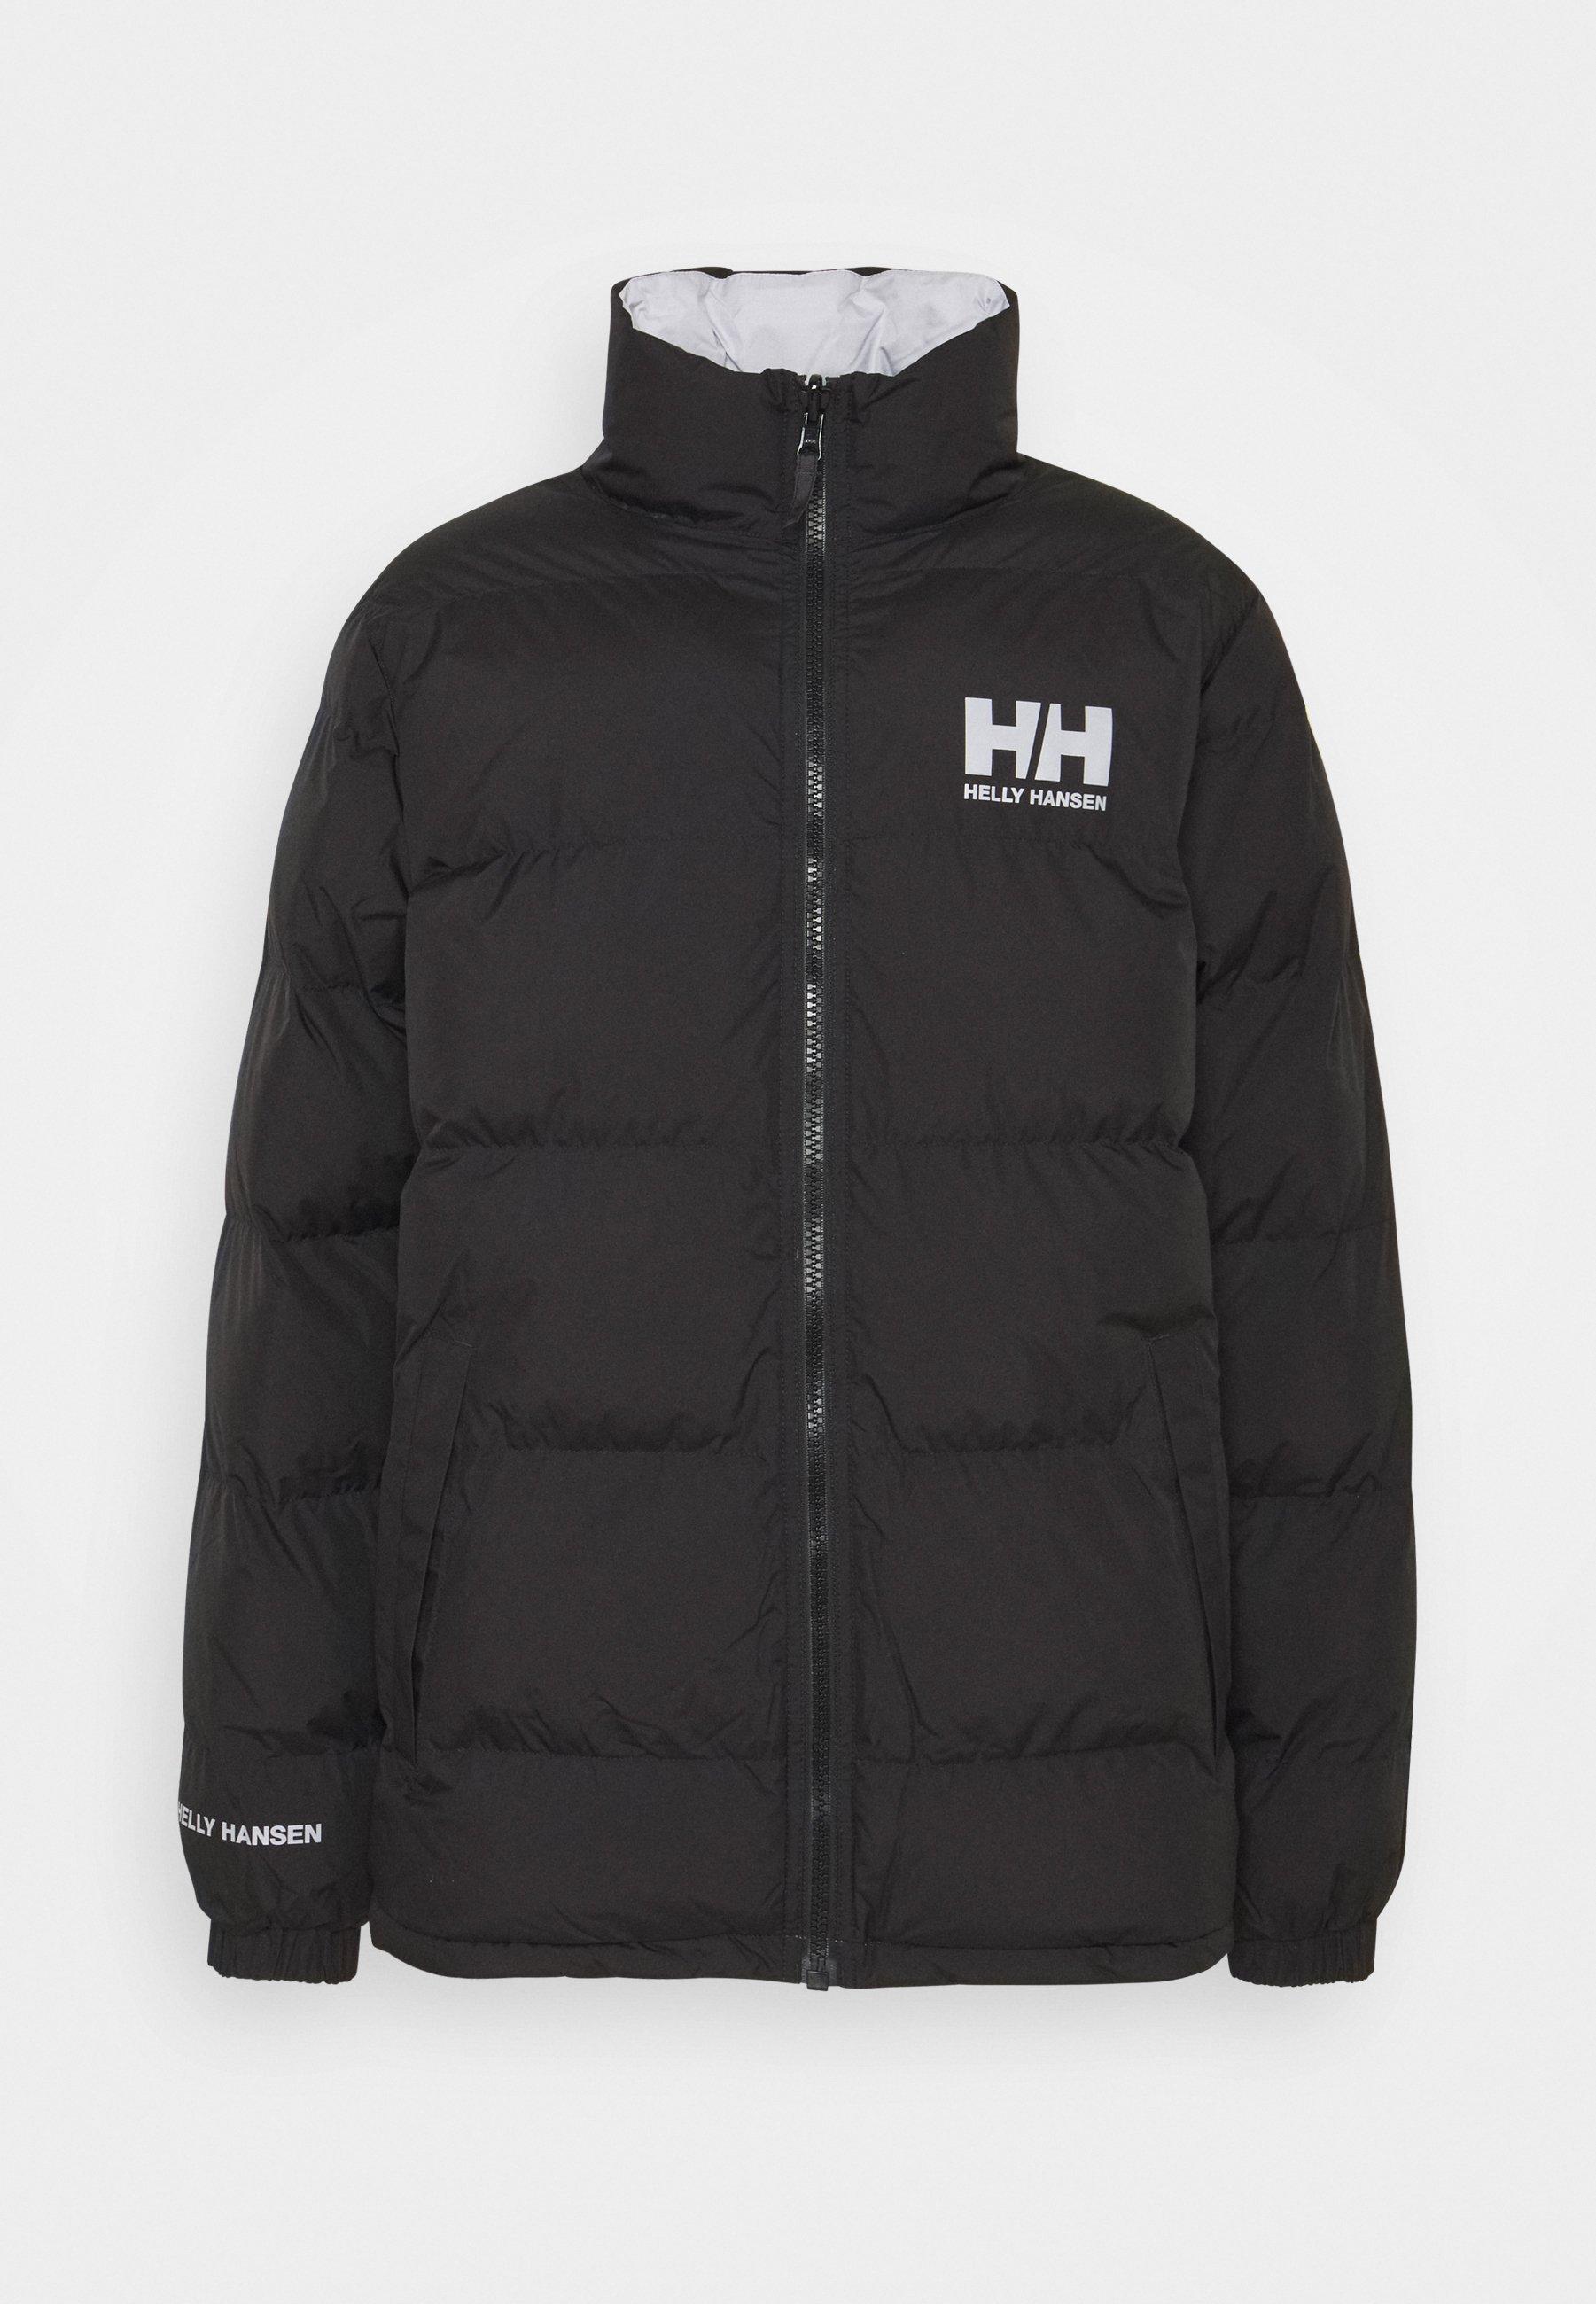 Helly Hansen Online Shop | Helly Hansen Schuhe & Mode